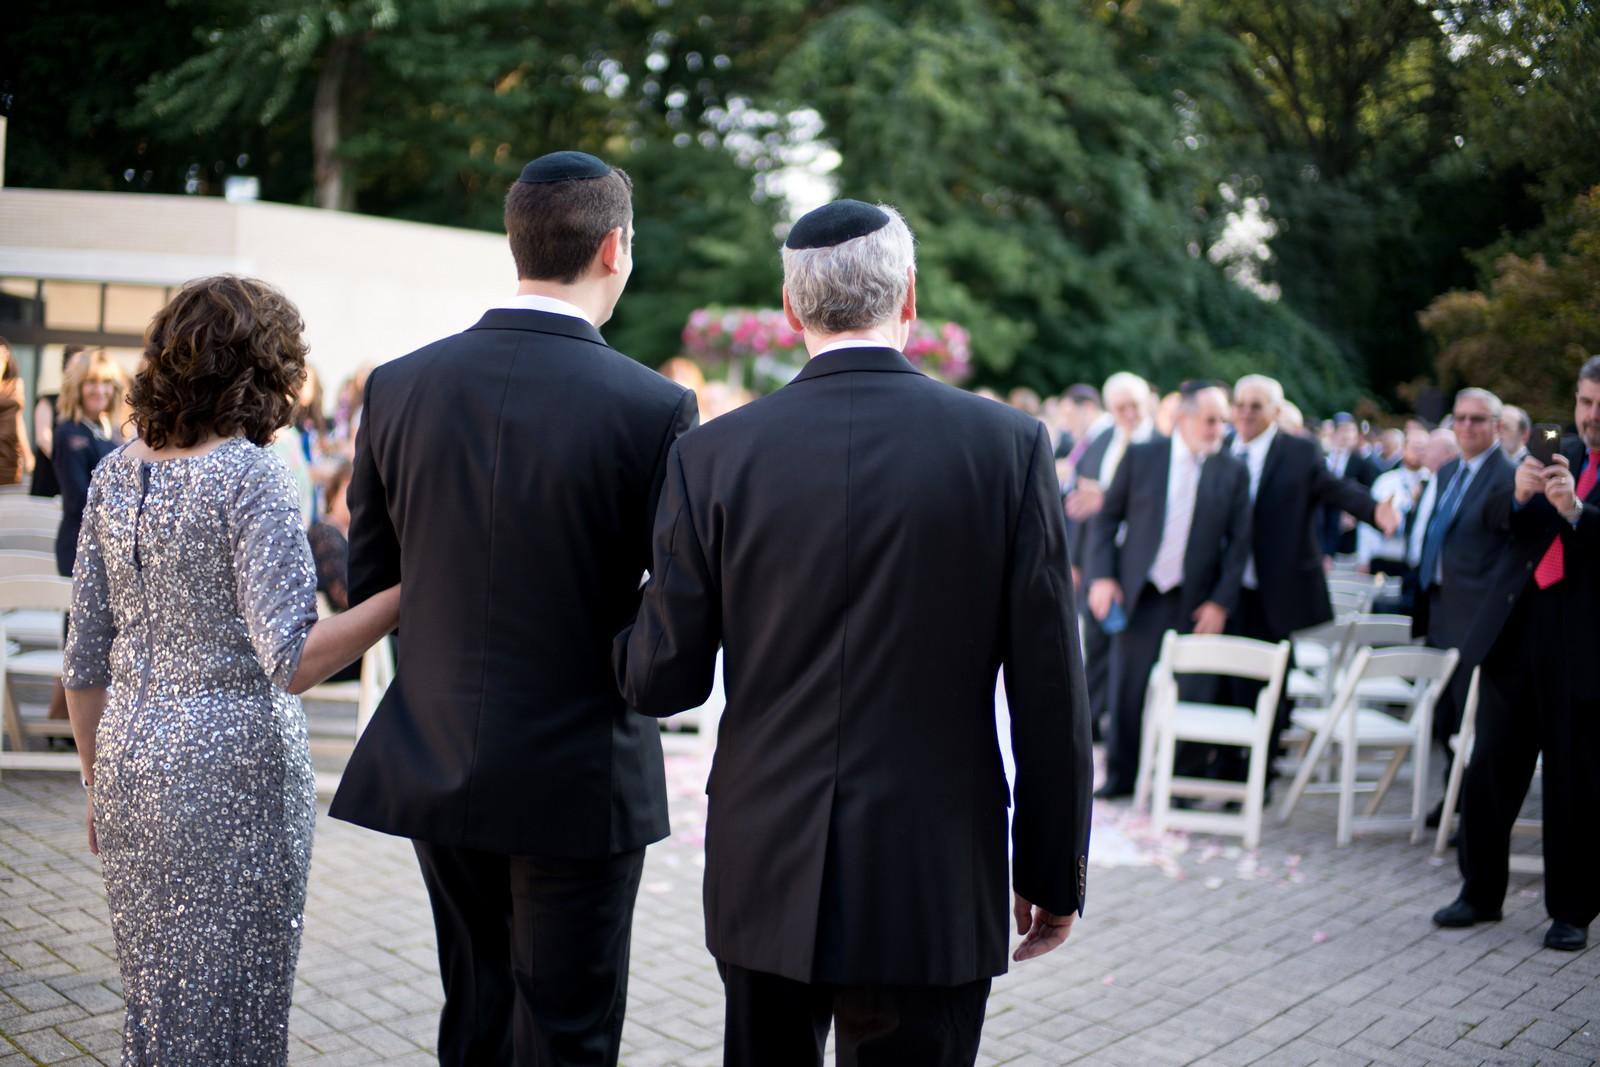 Josh and Michelle's Modern Jewish Wedding at Congregation Keter Torah, Teaneck, New Jersey Photos by Chaim Schvarcz, Groom, Chuppah, Walking